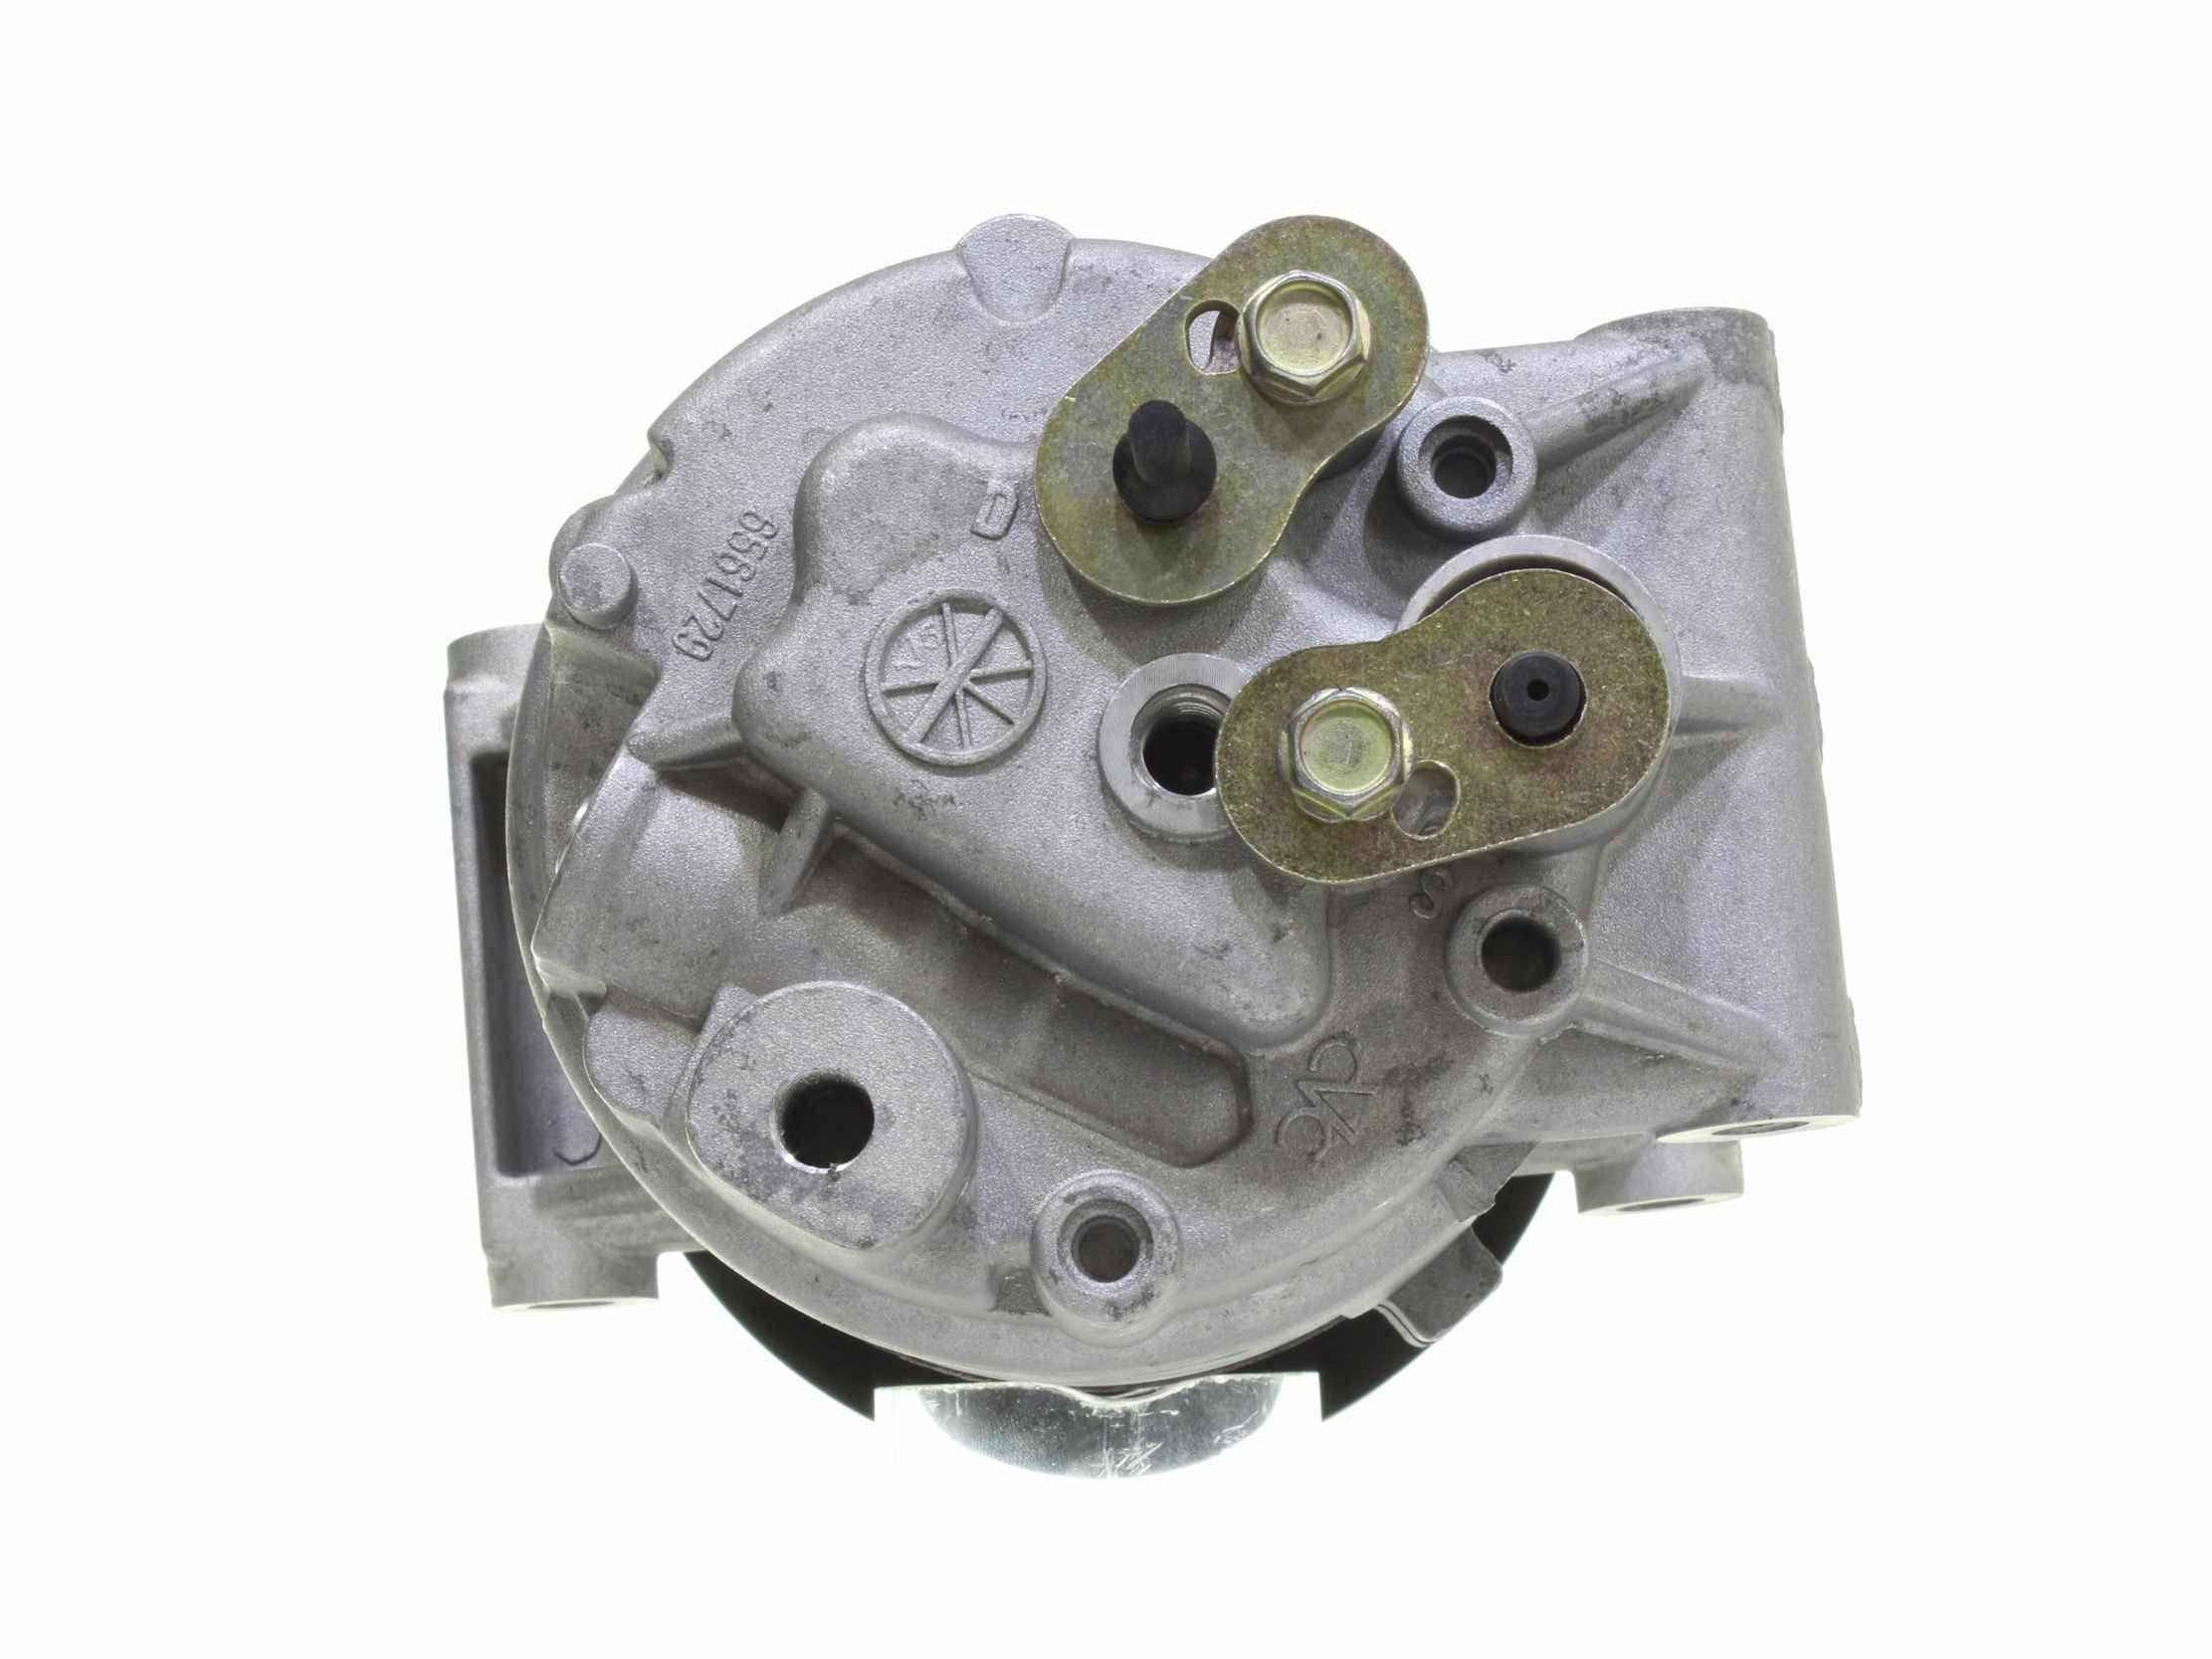 10550403 Kompressor ALANKO - Markenprodukte billig